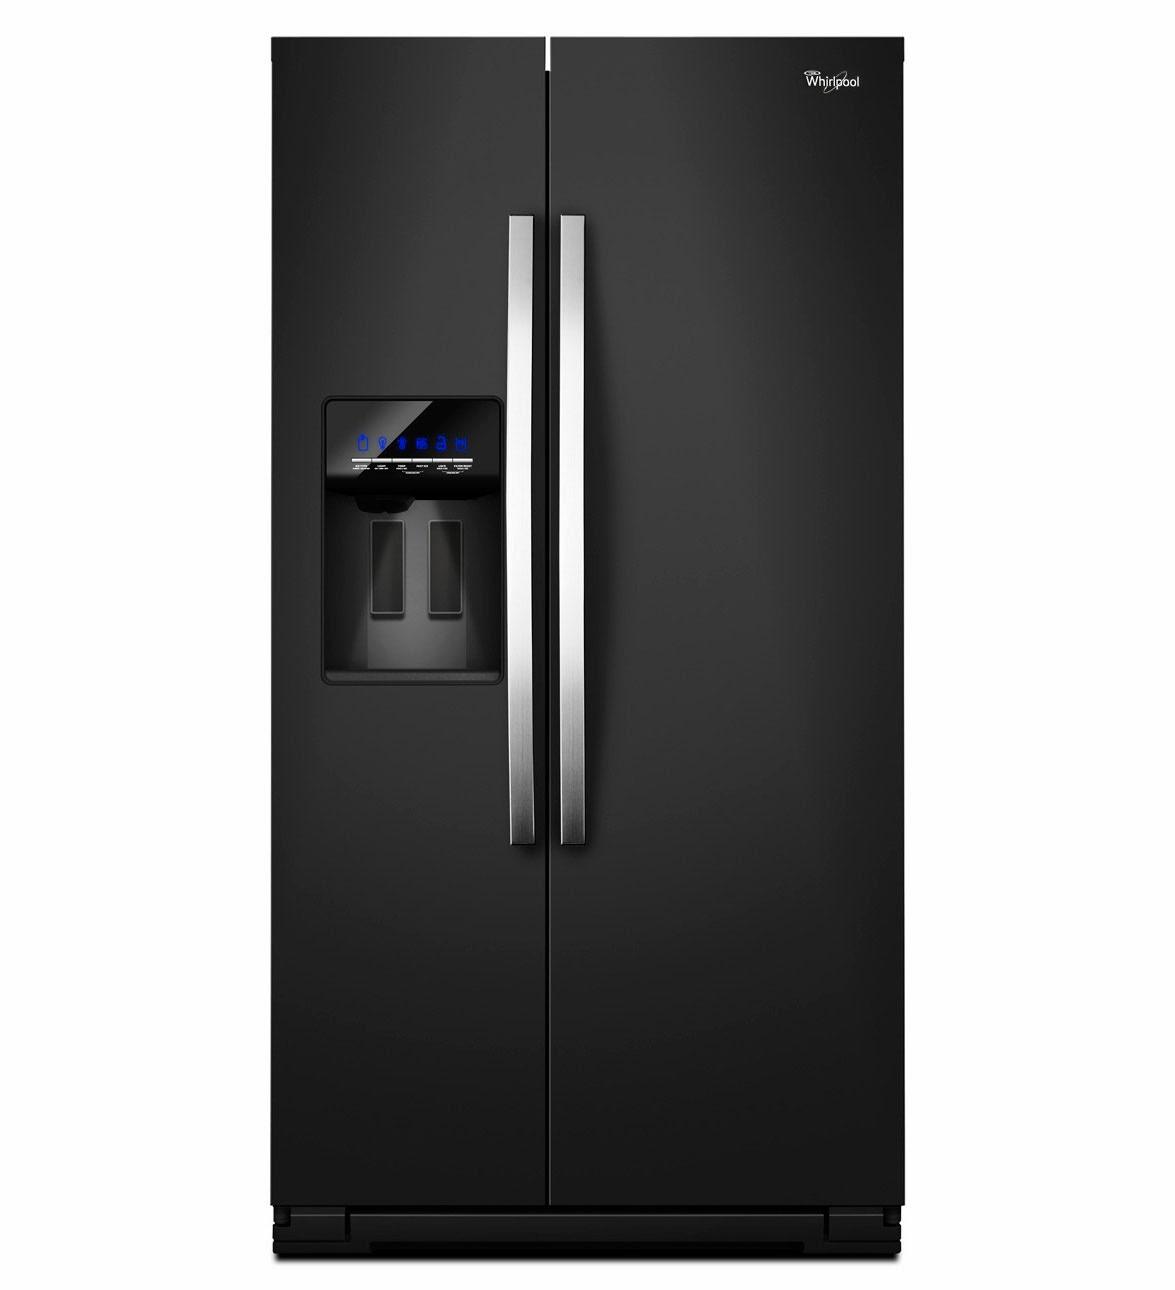 Whirlpool refrigerator brand whirlpool refrigerator wrs526siae - Whirlpool side by side ...